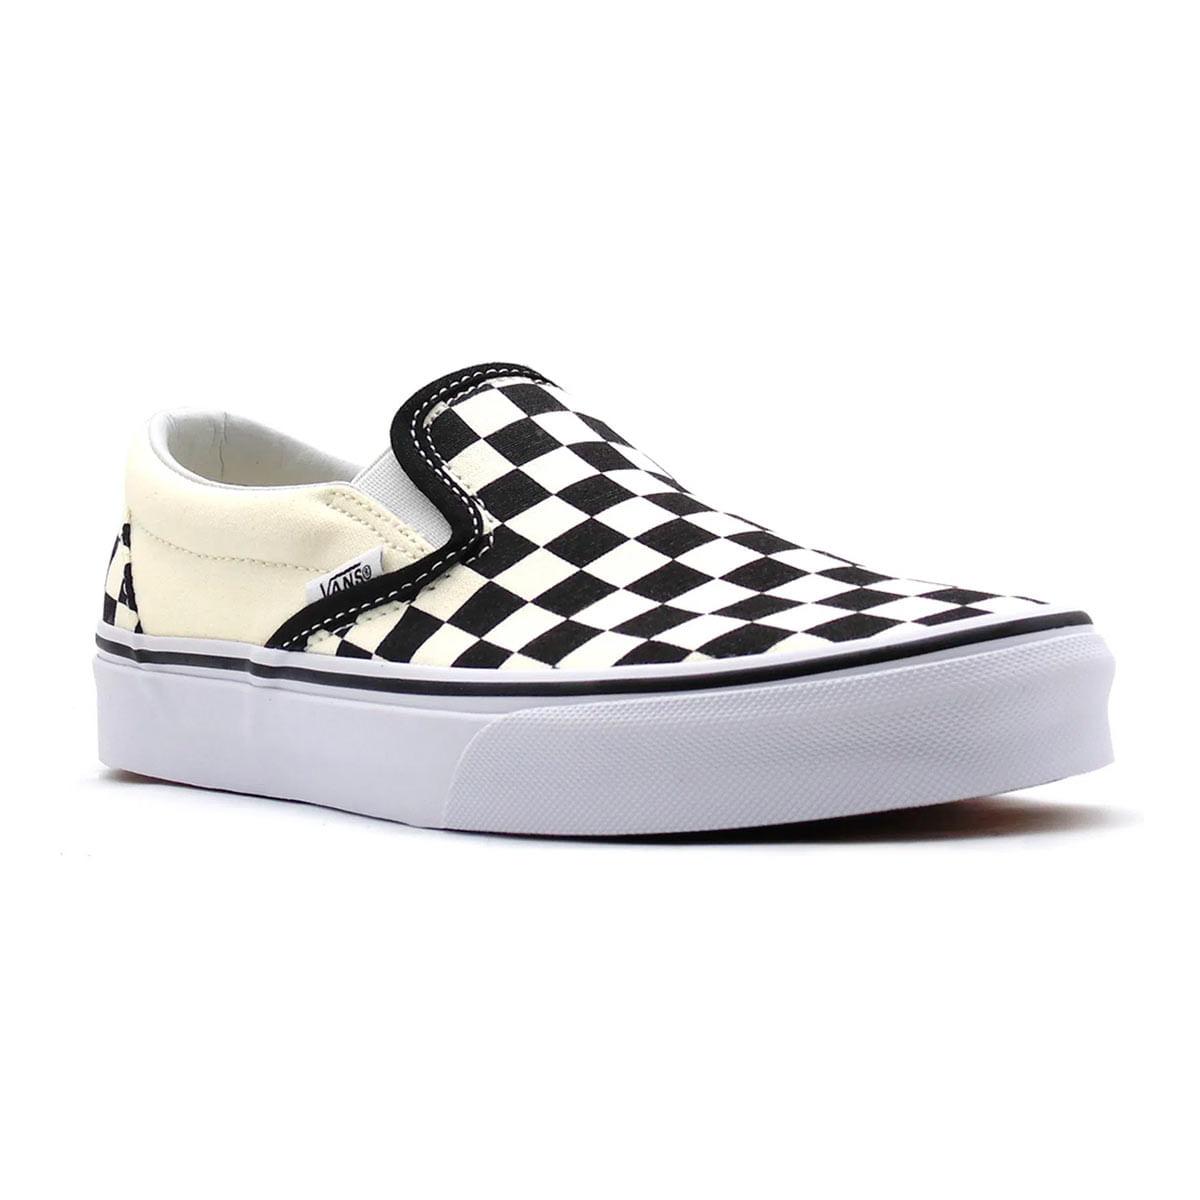 Tenis-Vans-UA-Classic-Slipon-Checkerboard--33-38--VNB00EYEBWW-2020